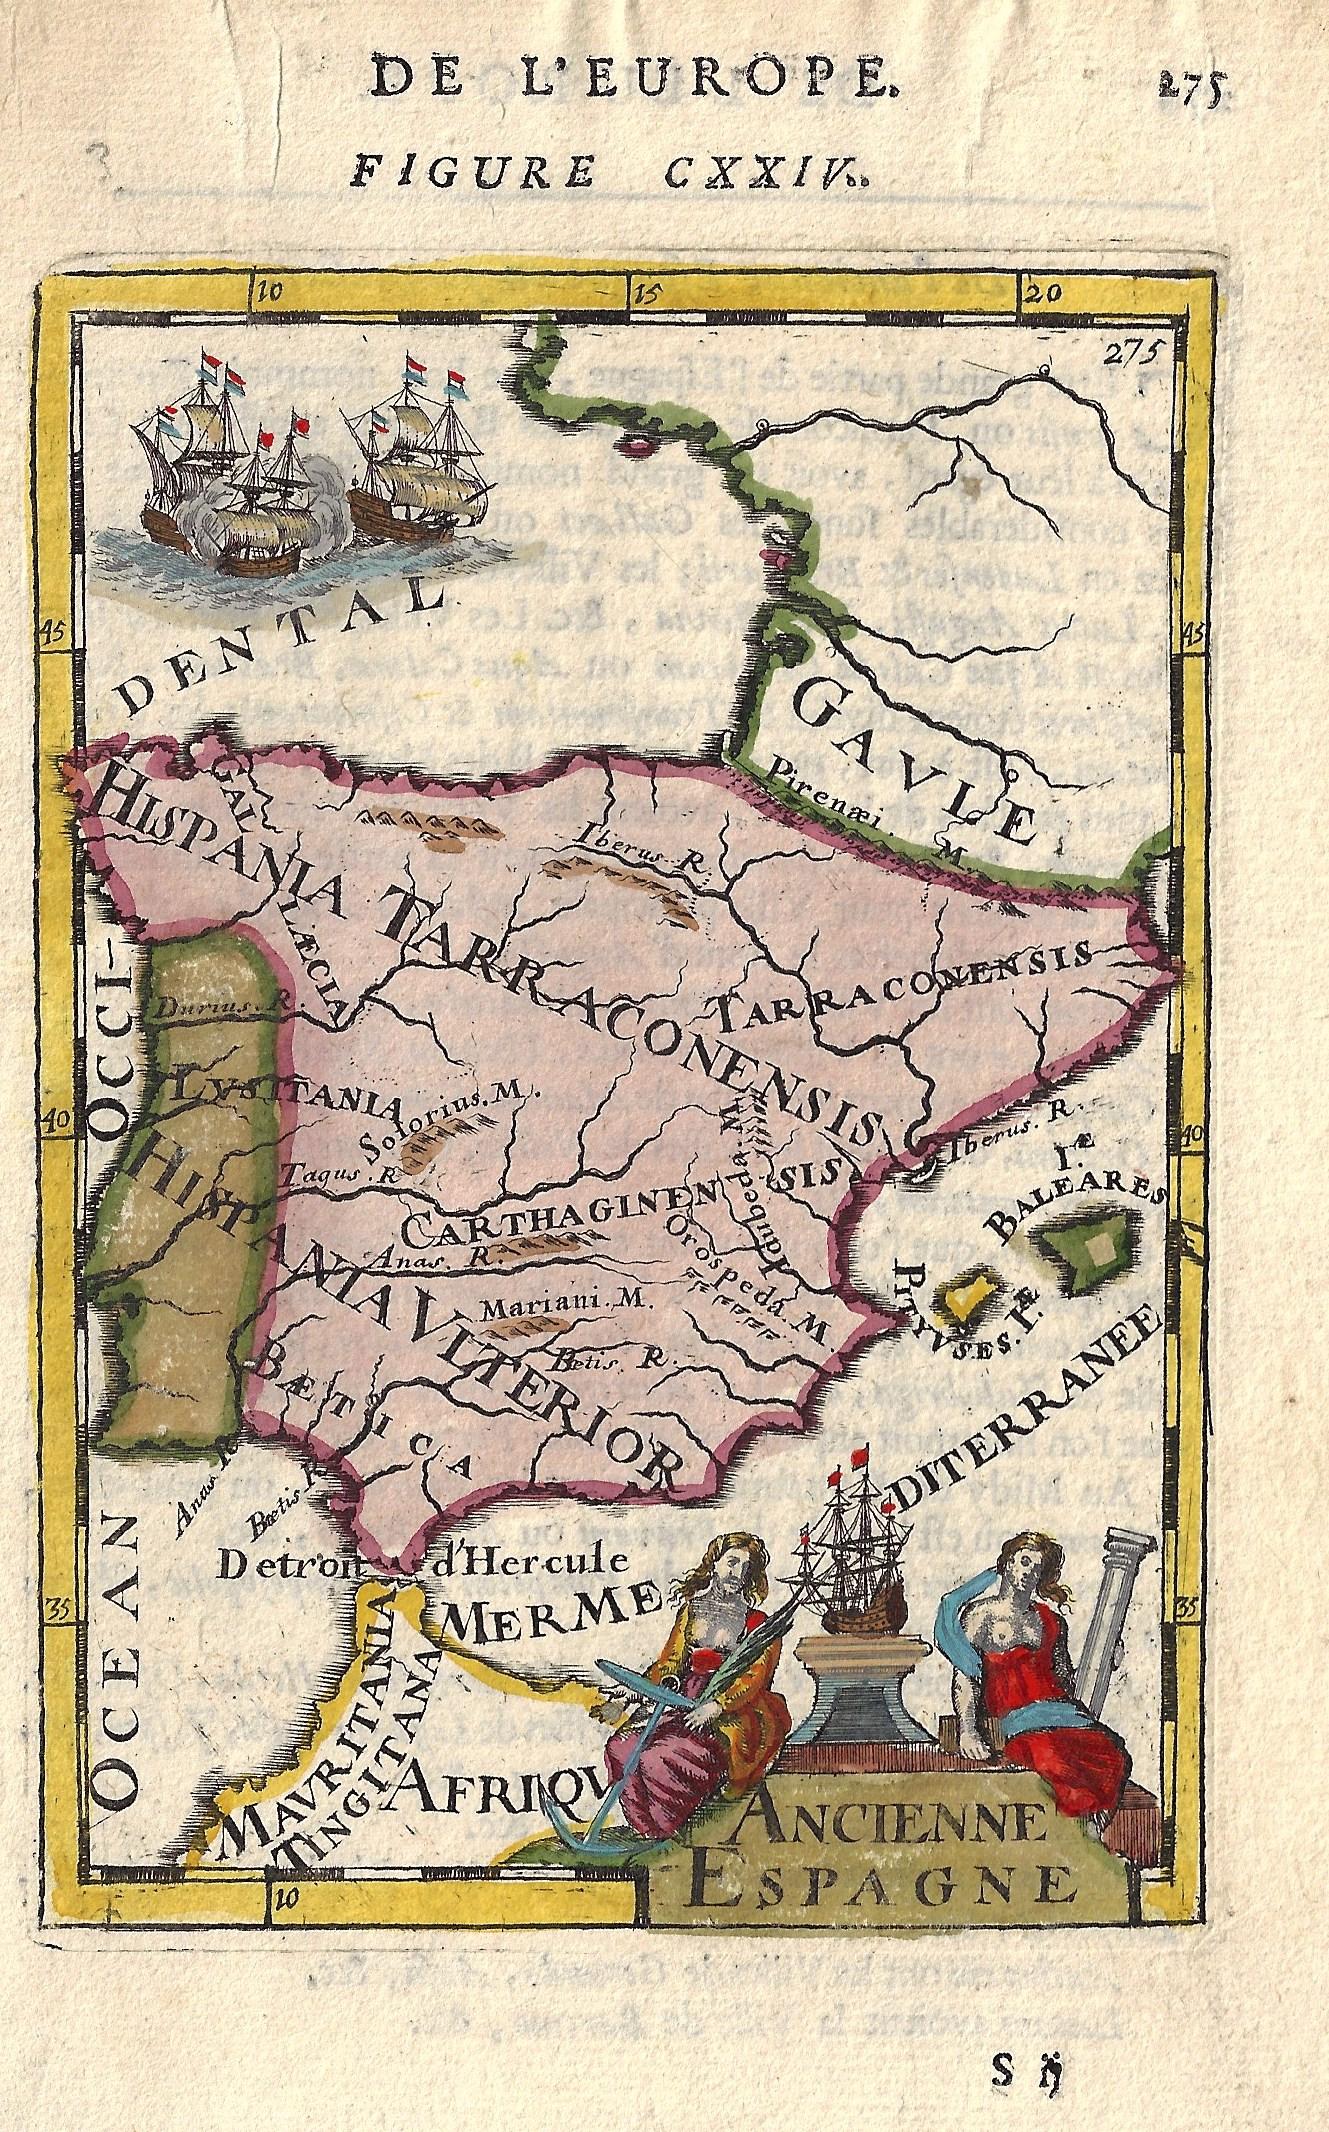 Mallet  Ancienne Espagne